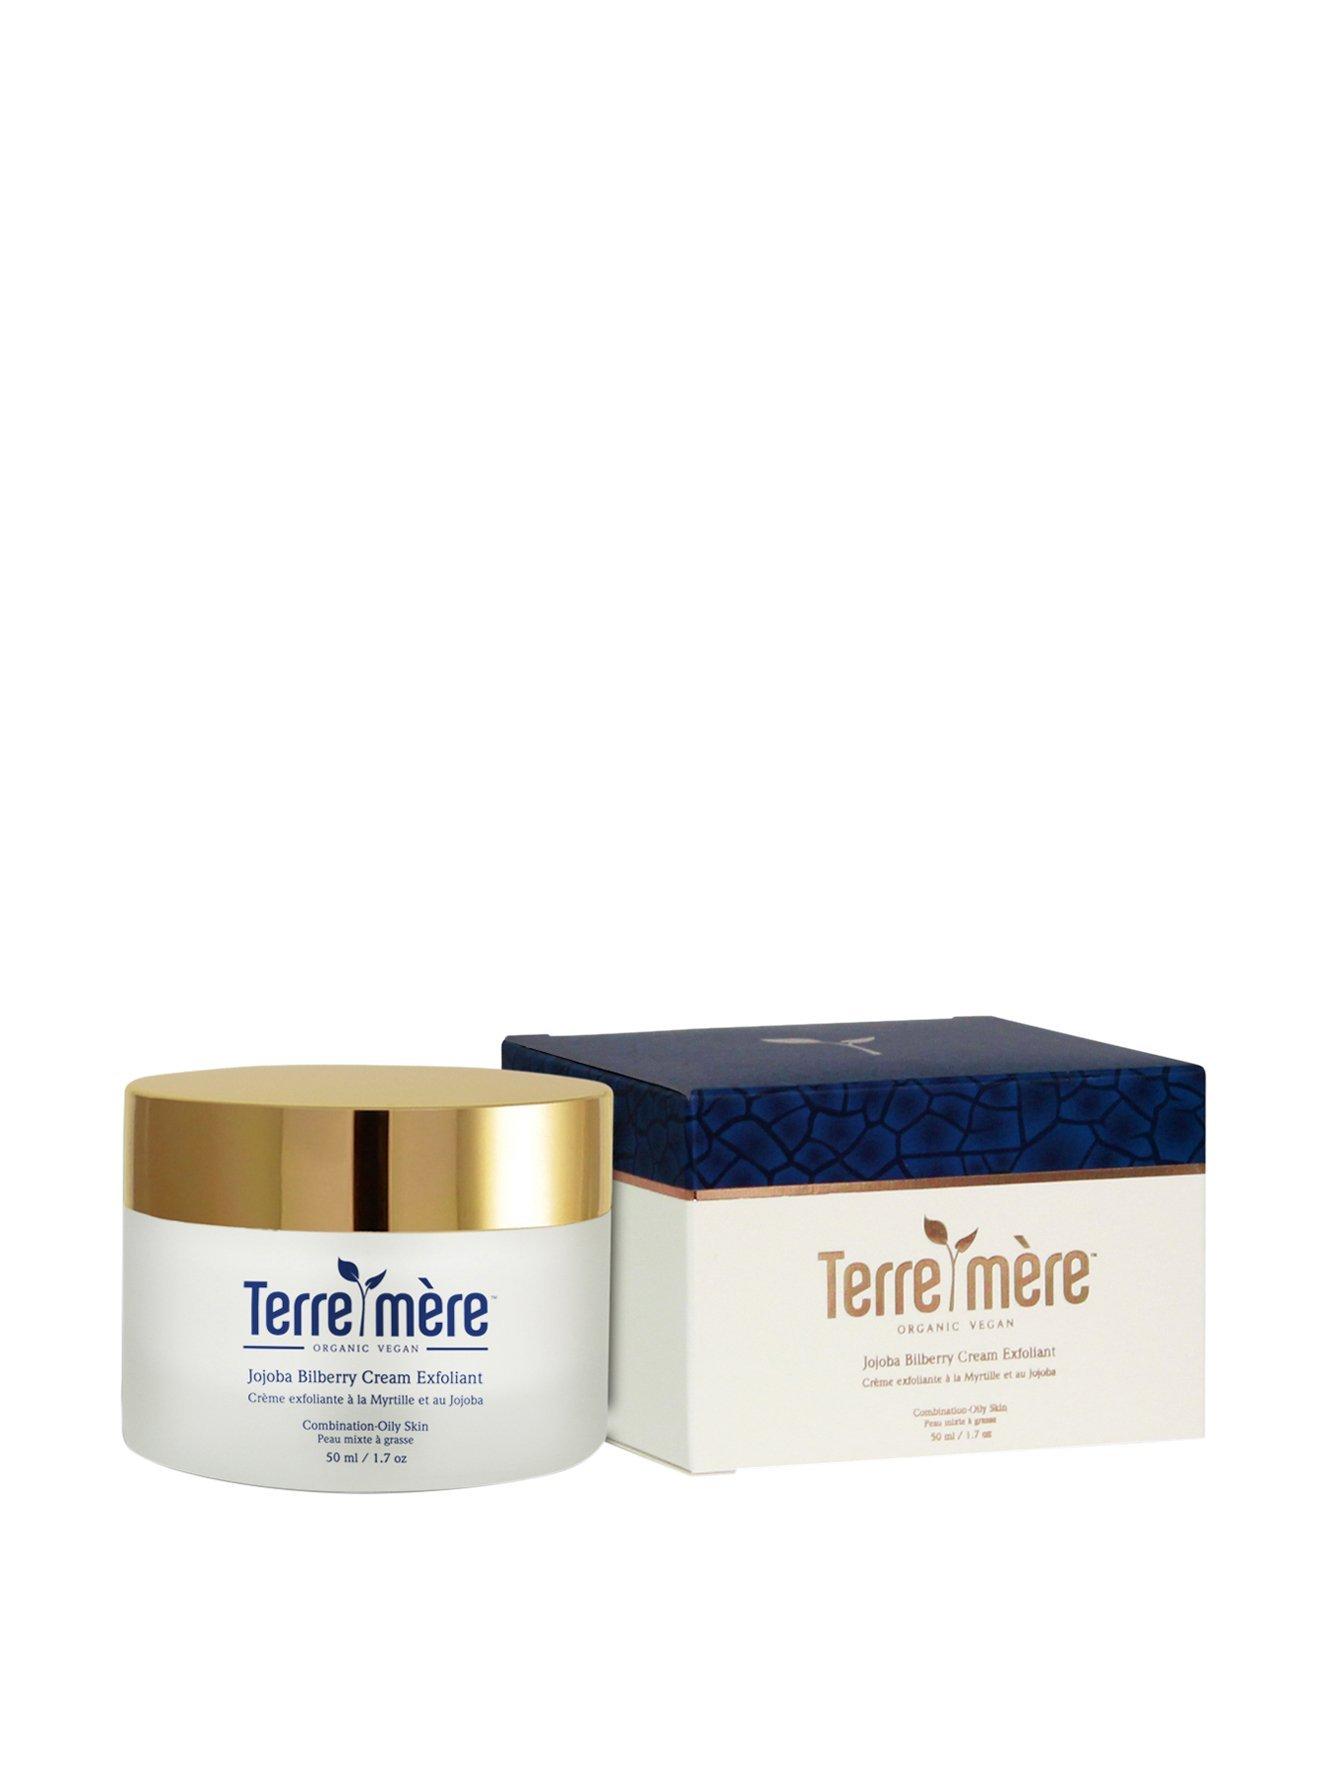 Terre Mere Cosmetics Cream Exfoliate, Jojoba Bilberry